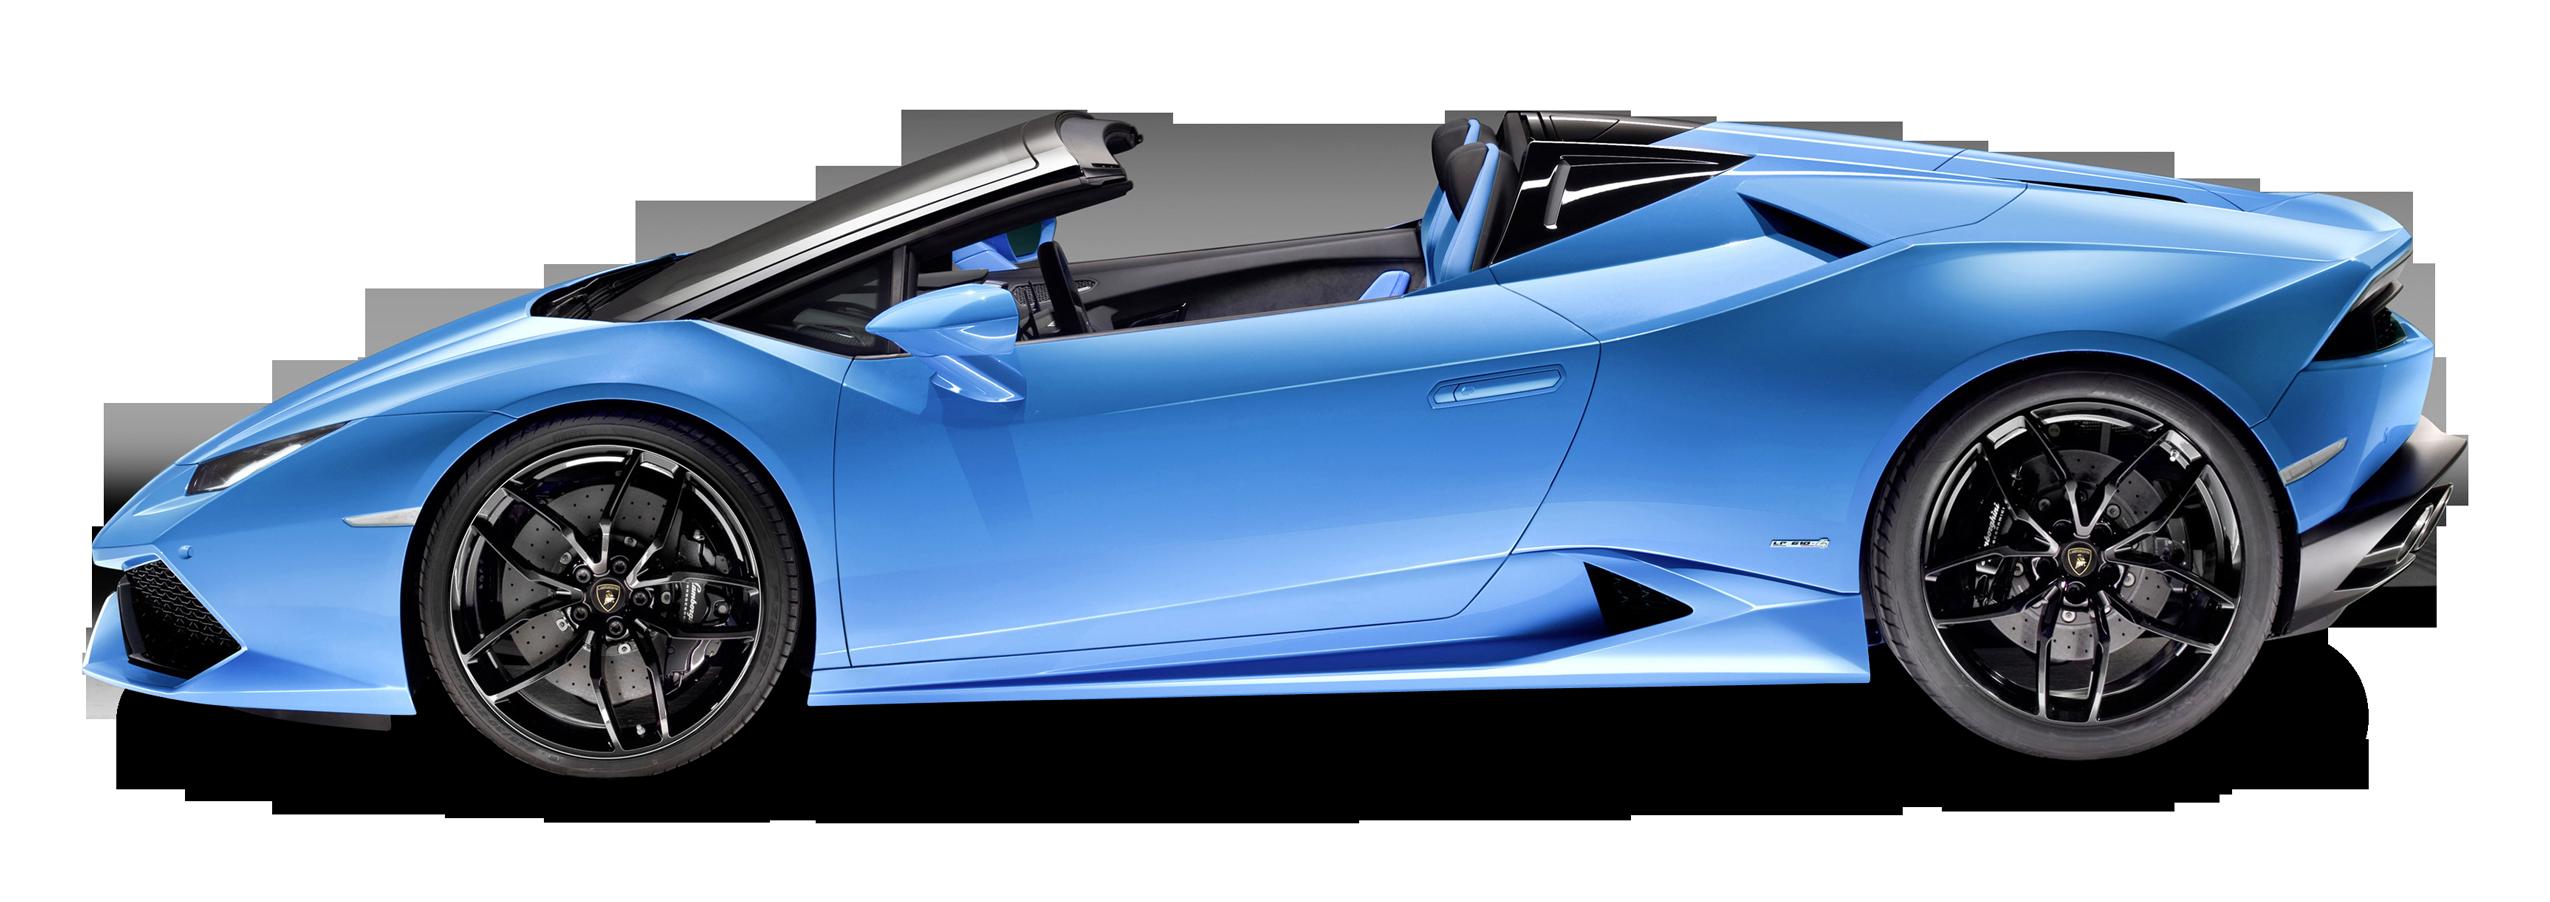 Blue Lamborghini Huracan LP 610 4 Spyder Car PNG Image